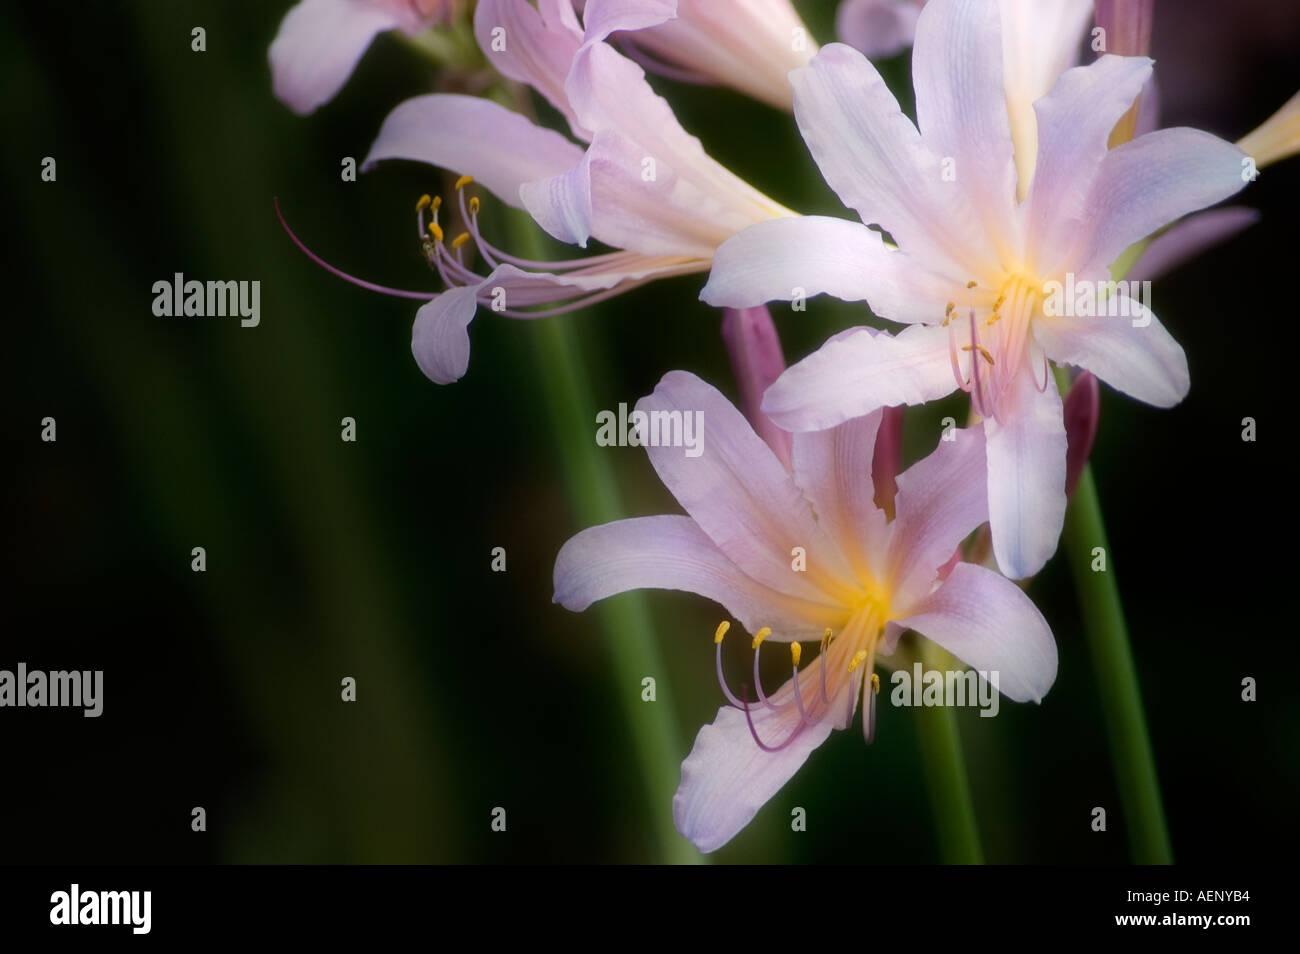 Magic lily stock photo 4482995 alamy magic lily izmirmasajfo